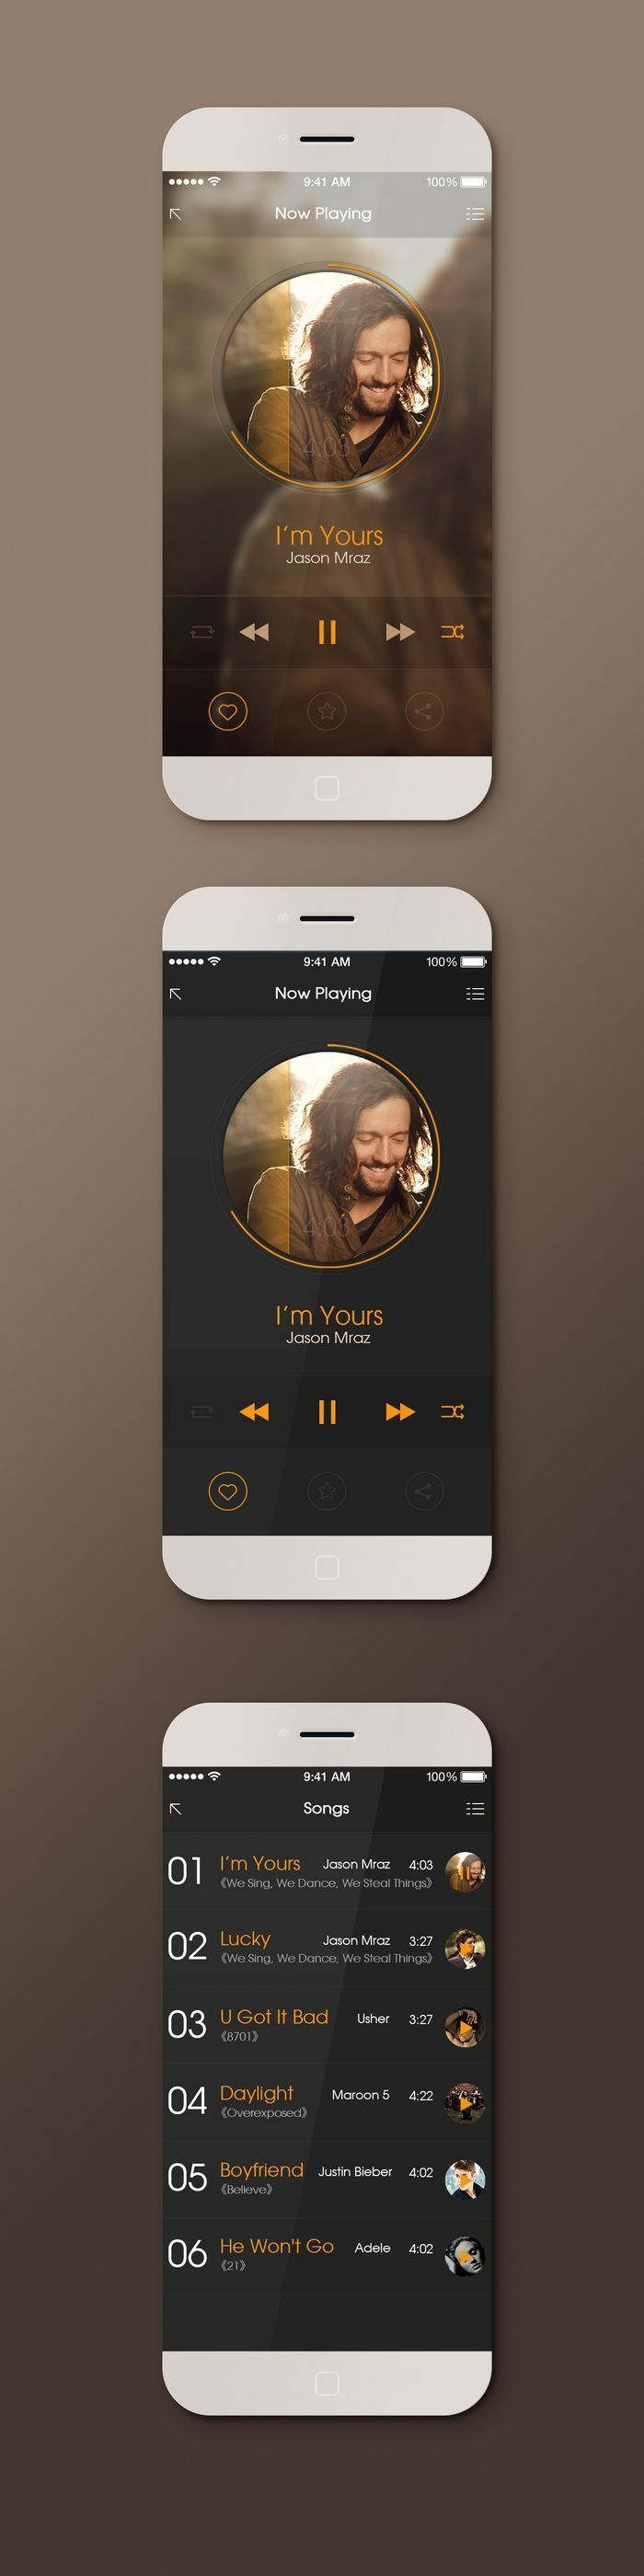 Imagine this design on the New Samsung Edge! | Quiksnip #pinterest